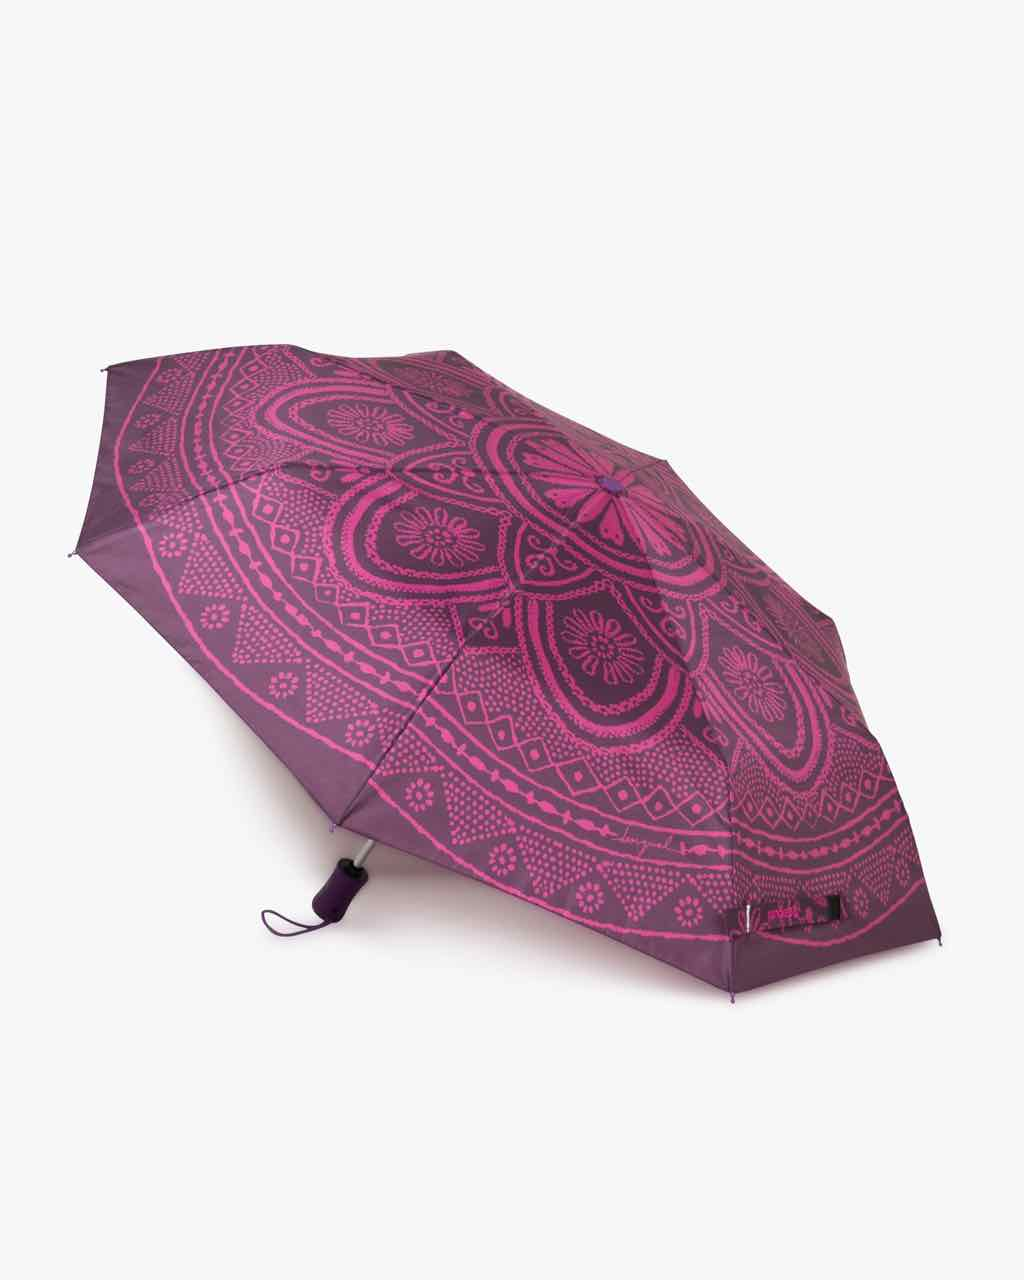 17WAOF53_3002 Desigual Umbrella Mandala Buy Online